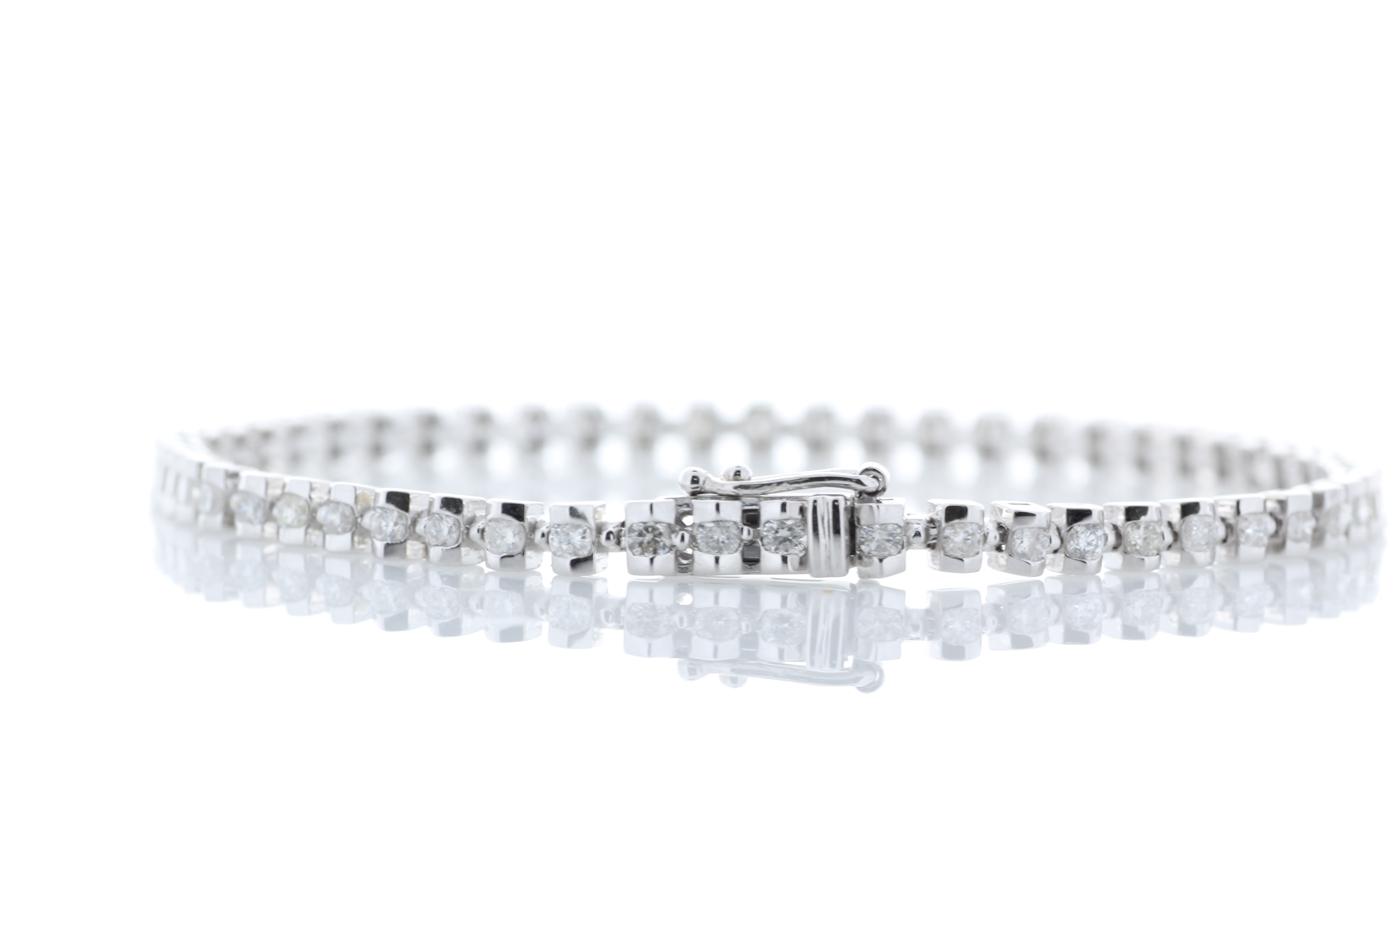 18ct White Gold Tennis Diamond Bracelet 1.82 Carats - Image 3 of 4